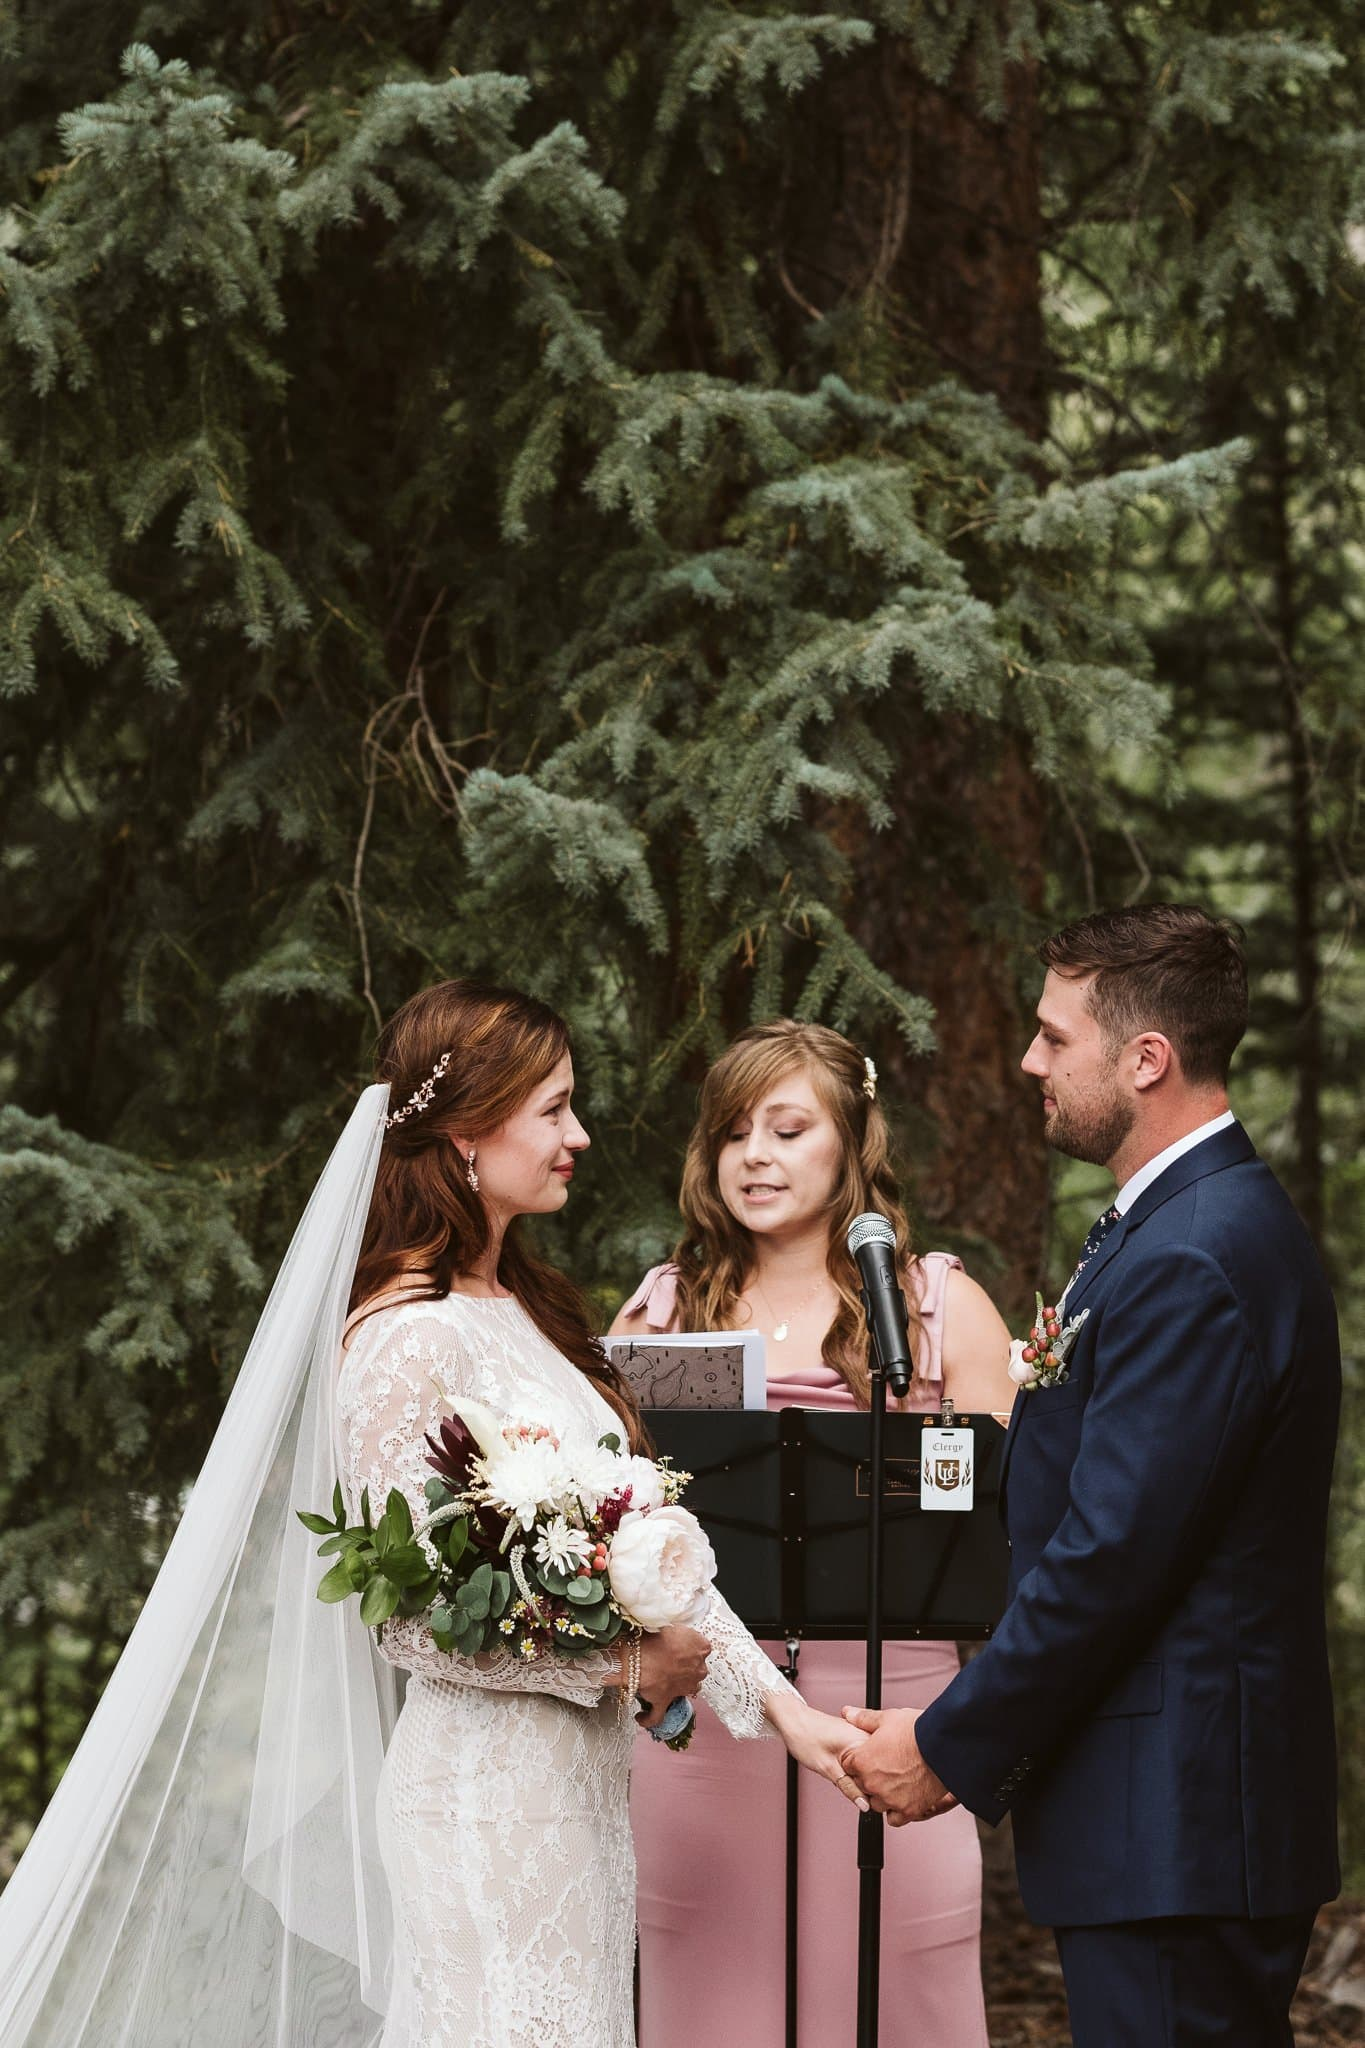 Rivertree Lodge wedding ceremony in Breckenridge, wedding in the woods of Colorado